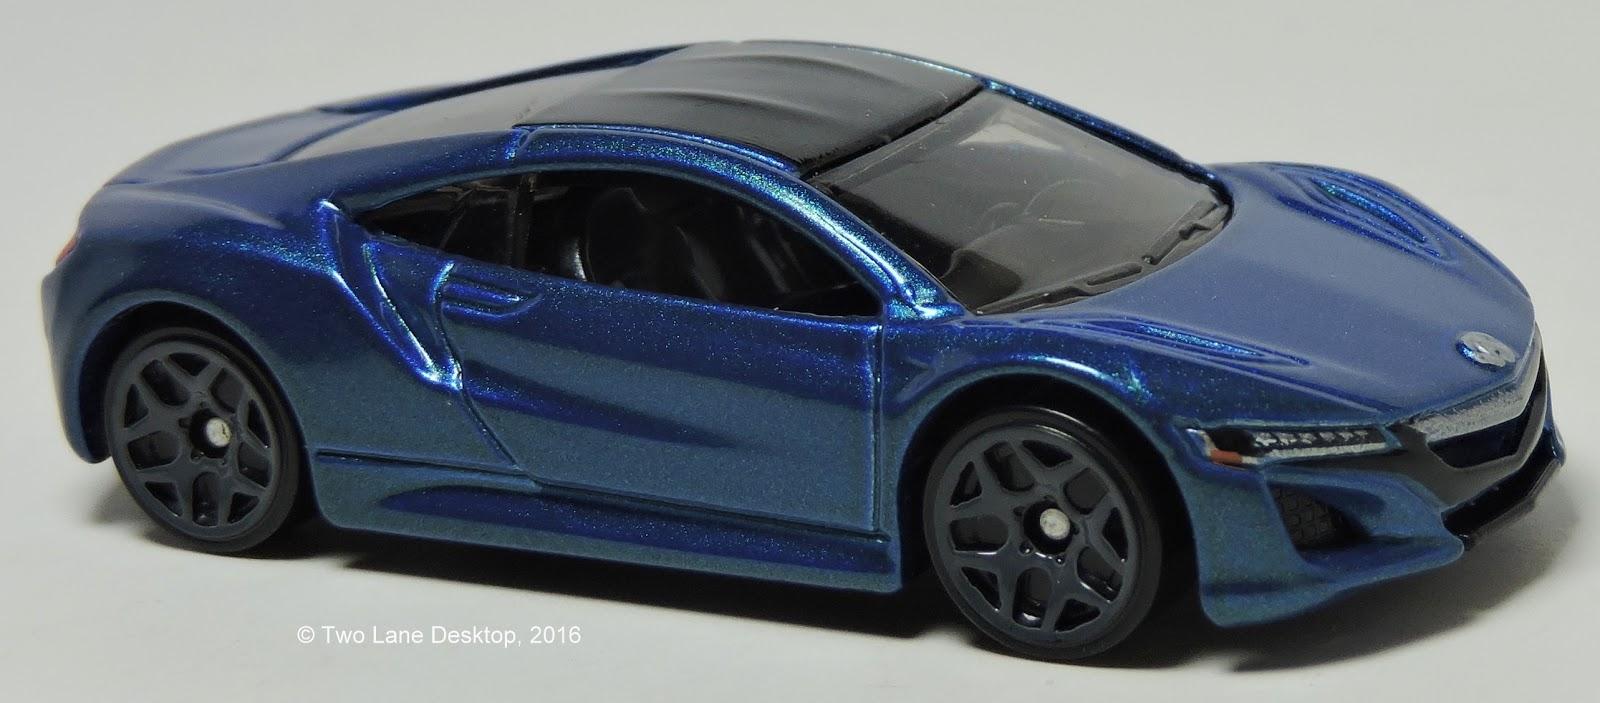 Two Lane Desktop: Hot Wheels 2017 Acura NSX